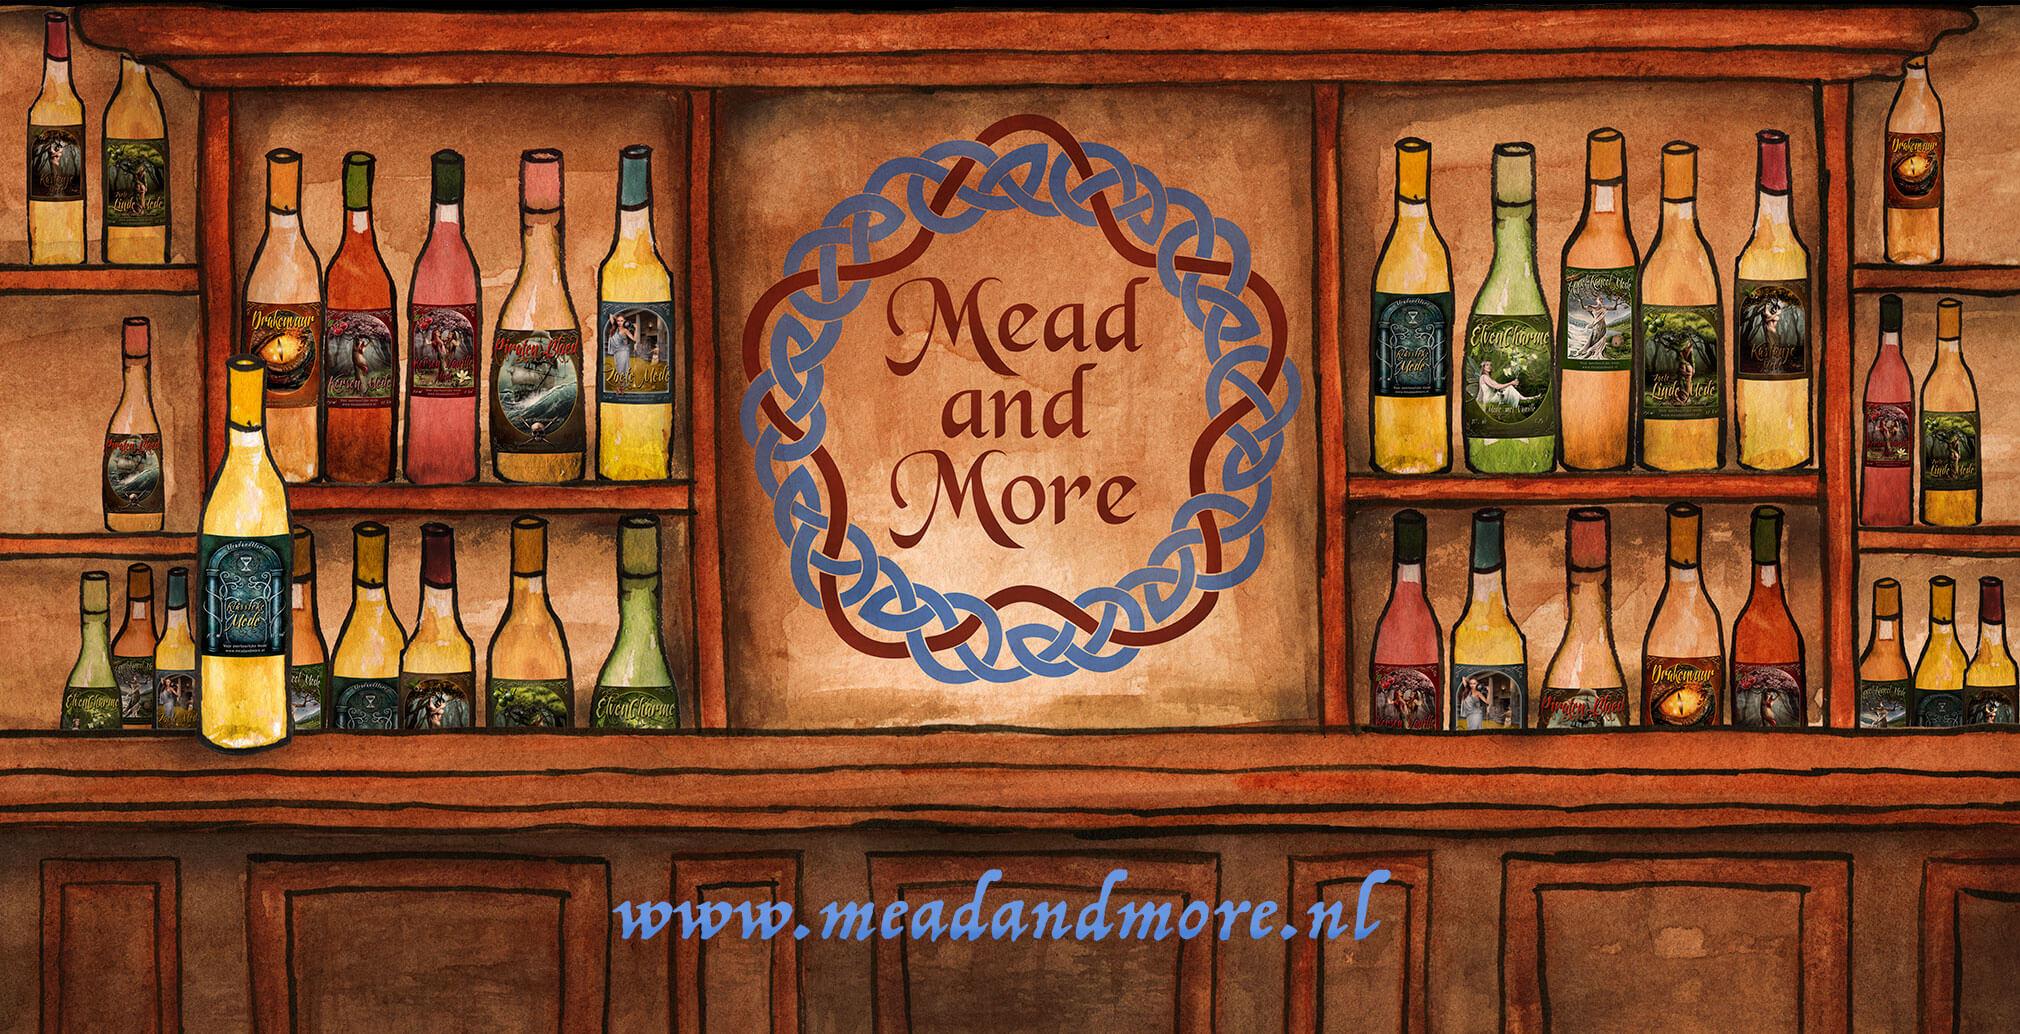 Mead & More hekbanner